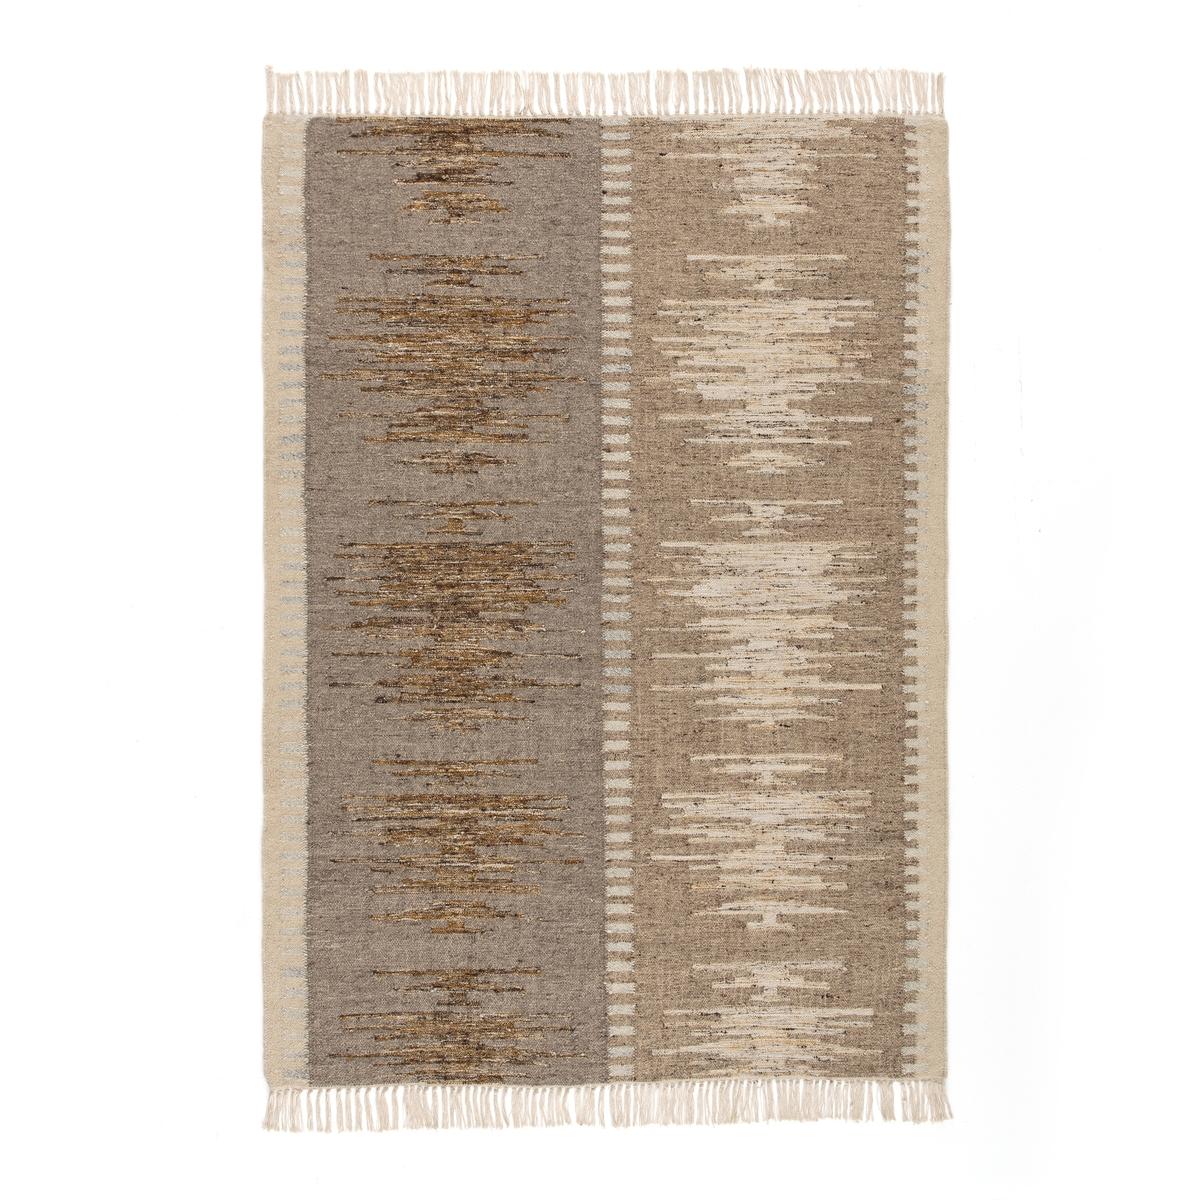 цена Ковер La Redoute Килим из шерсти Folima 120 x 170 см бежевый онлайн в 2017 году